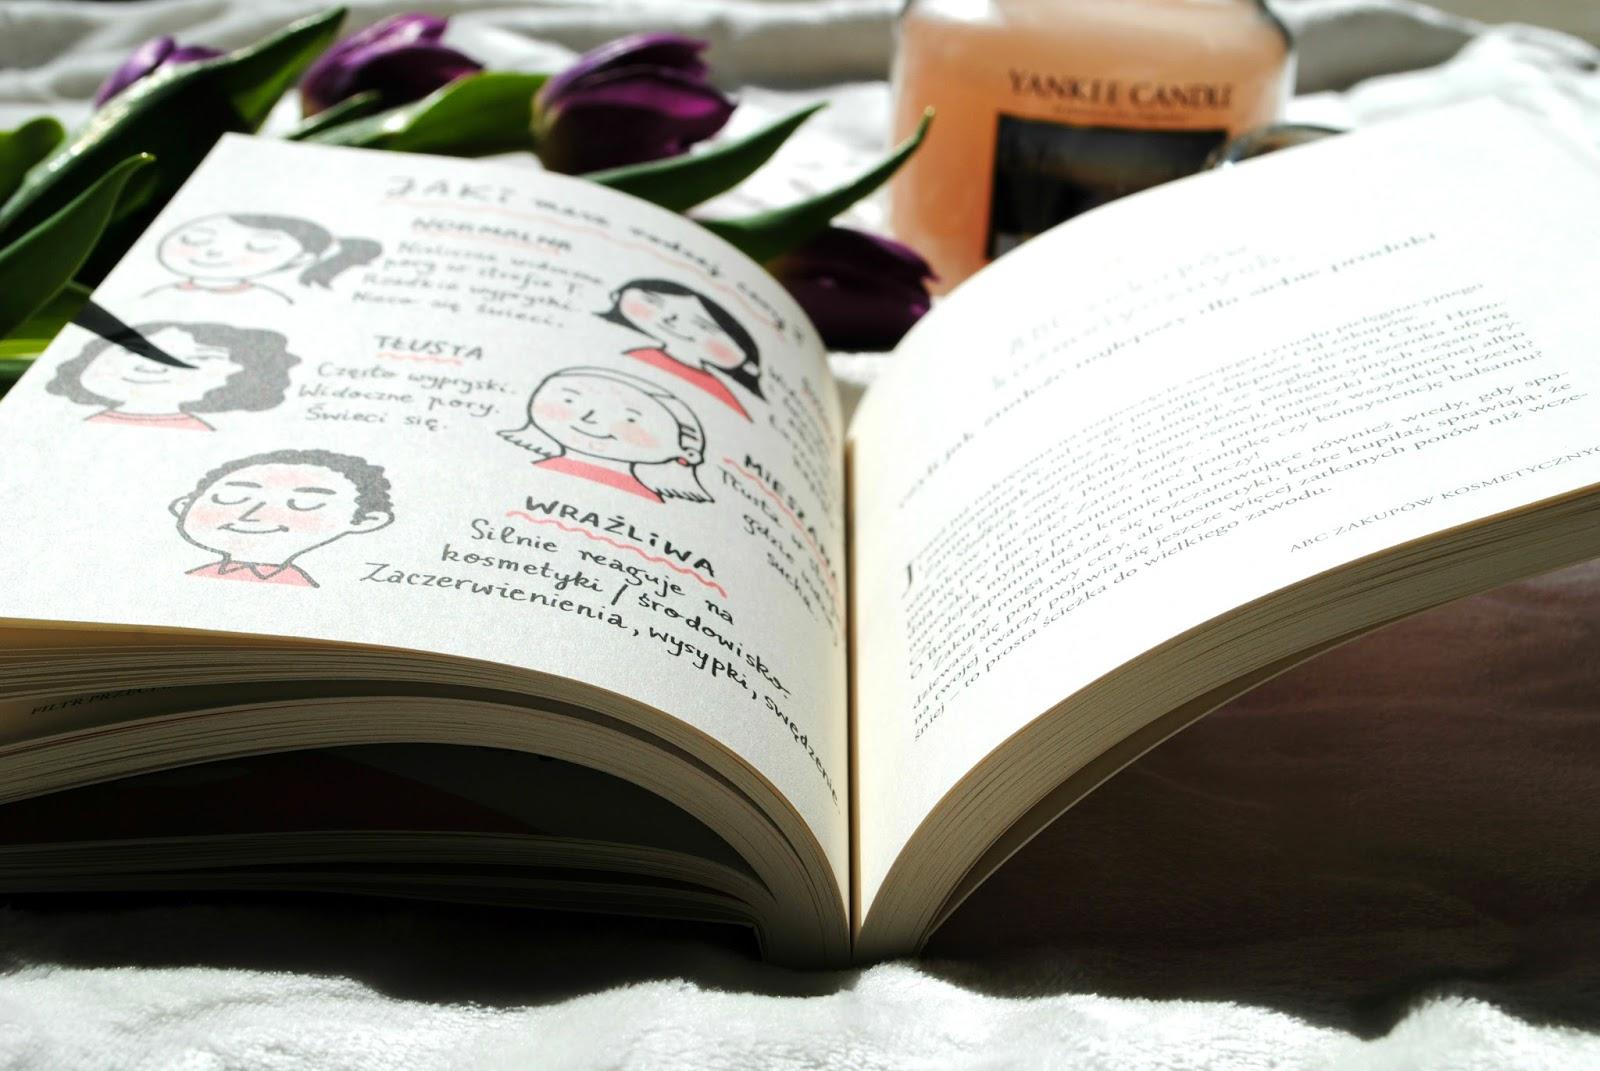 Sekrety urody koreanek, książka, recenzja beautypediapatt